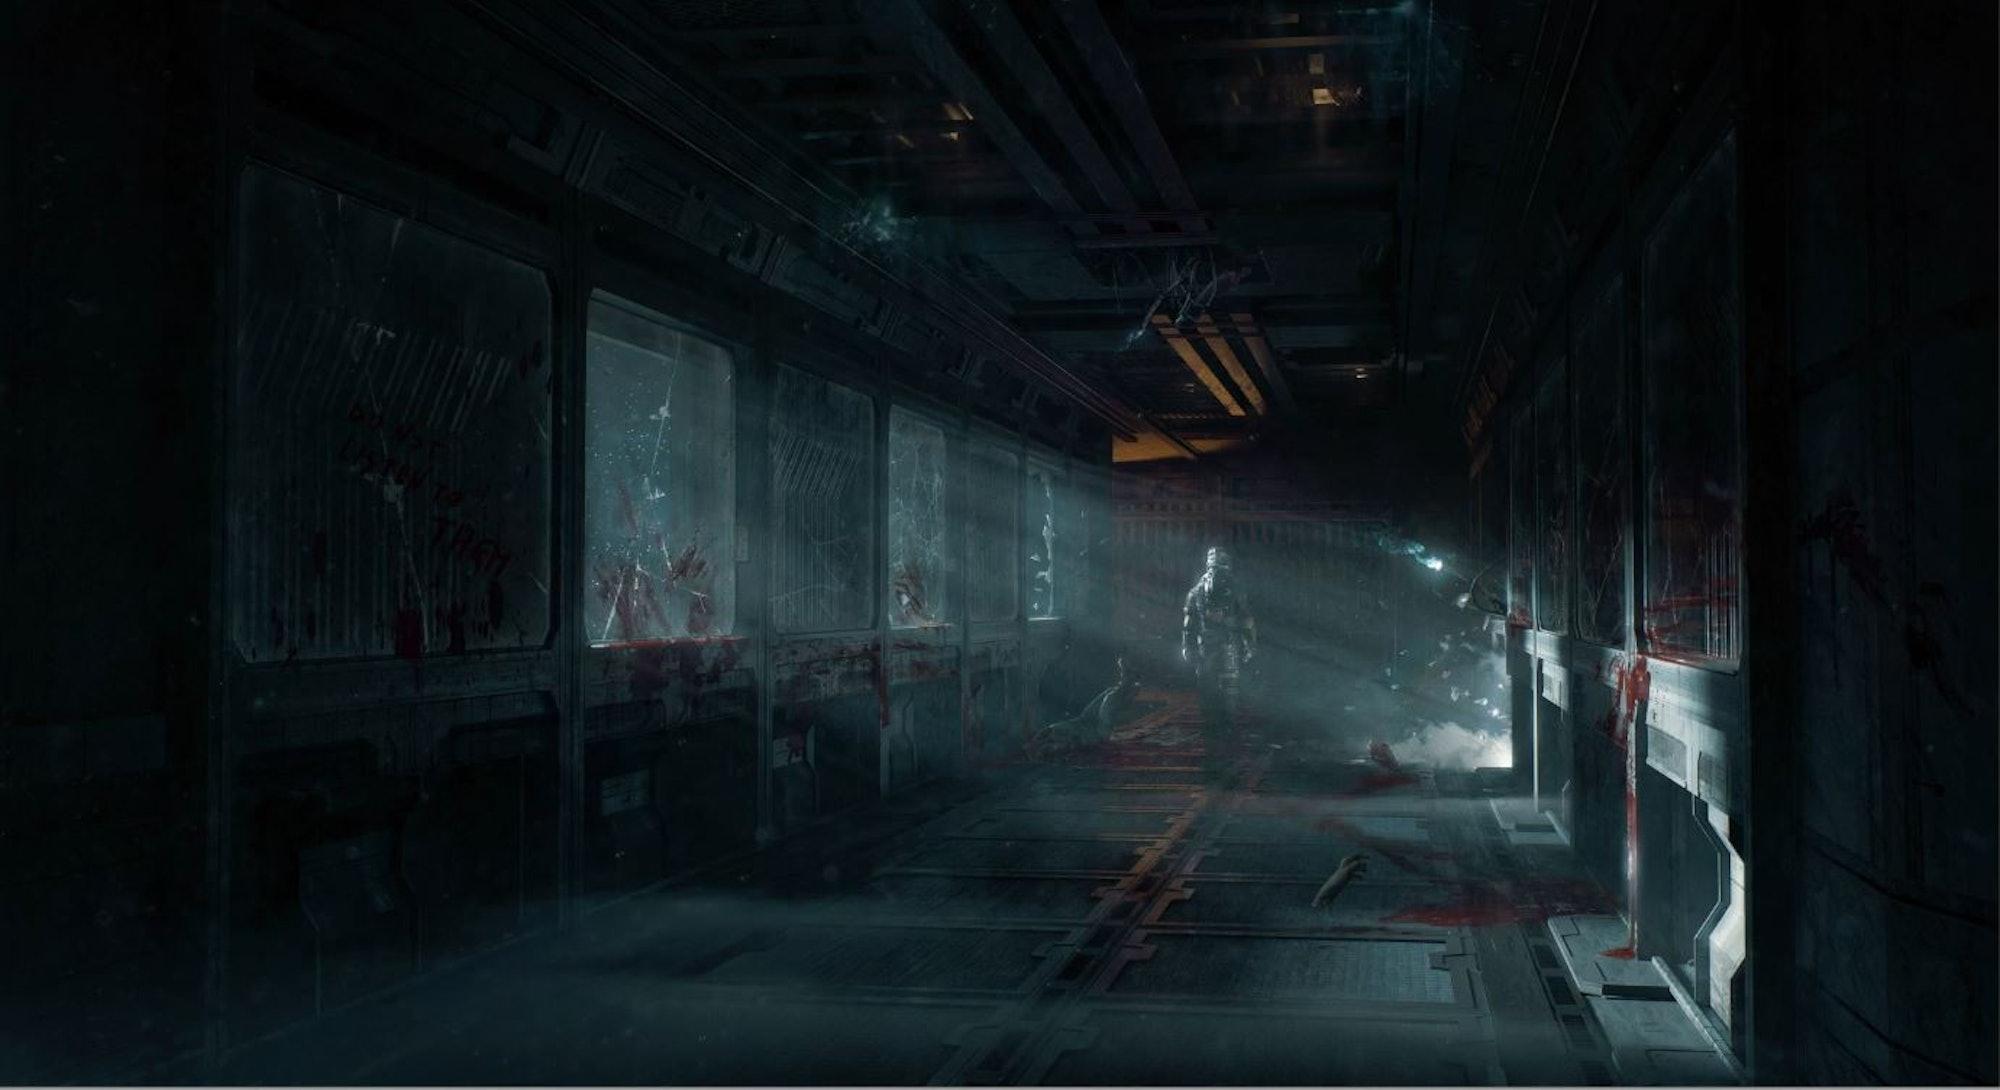 Dead Space hallway